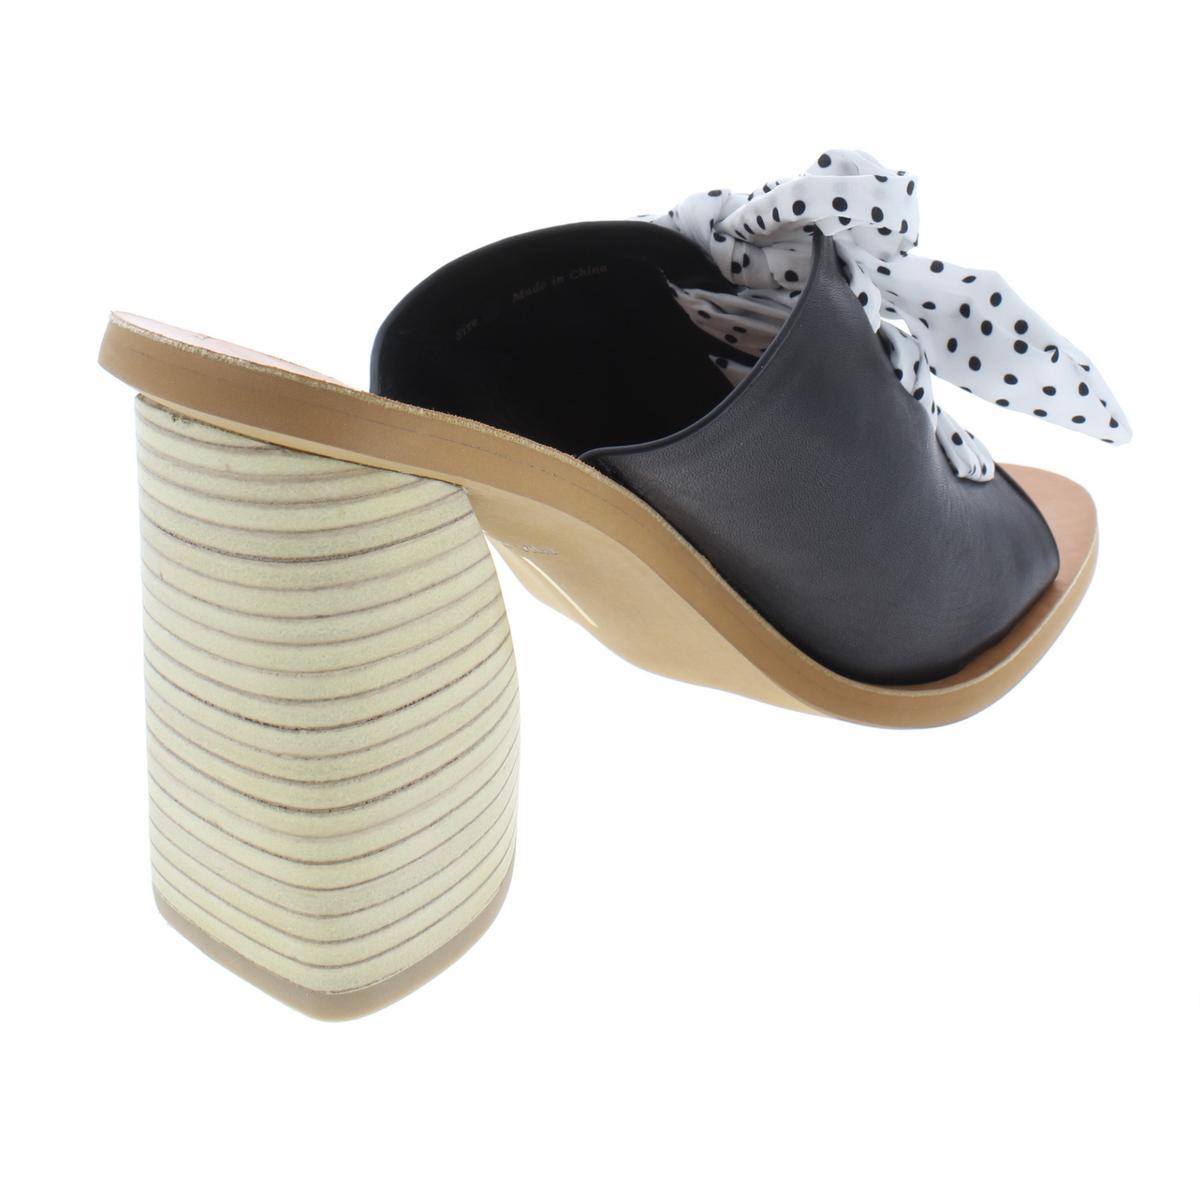 Dolce-Vita-Womens-Amber-Leather-Open-Toe-Slip-On-Heels-Sandals-BHFO-8080 thumbnail 4